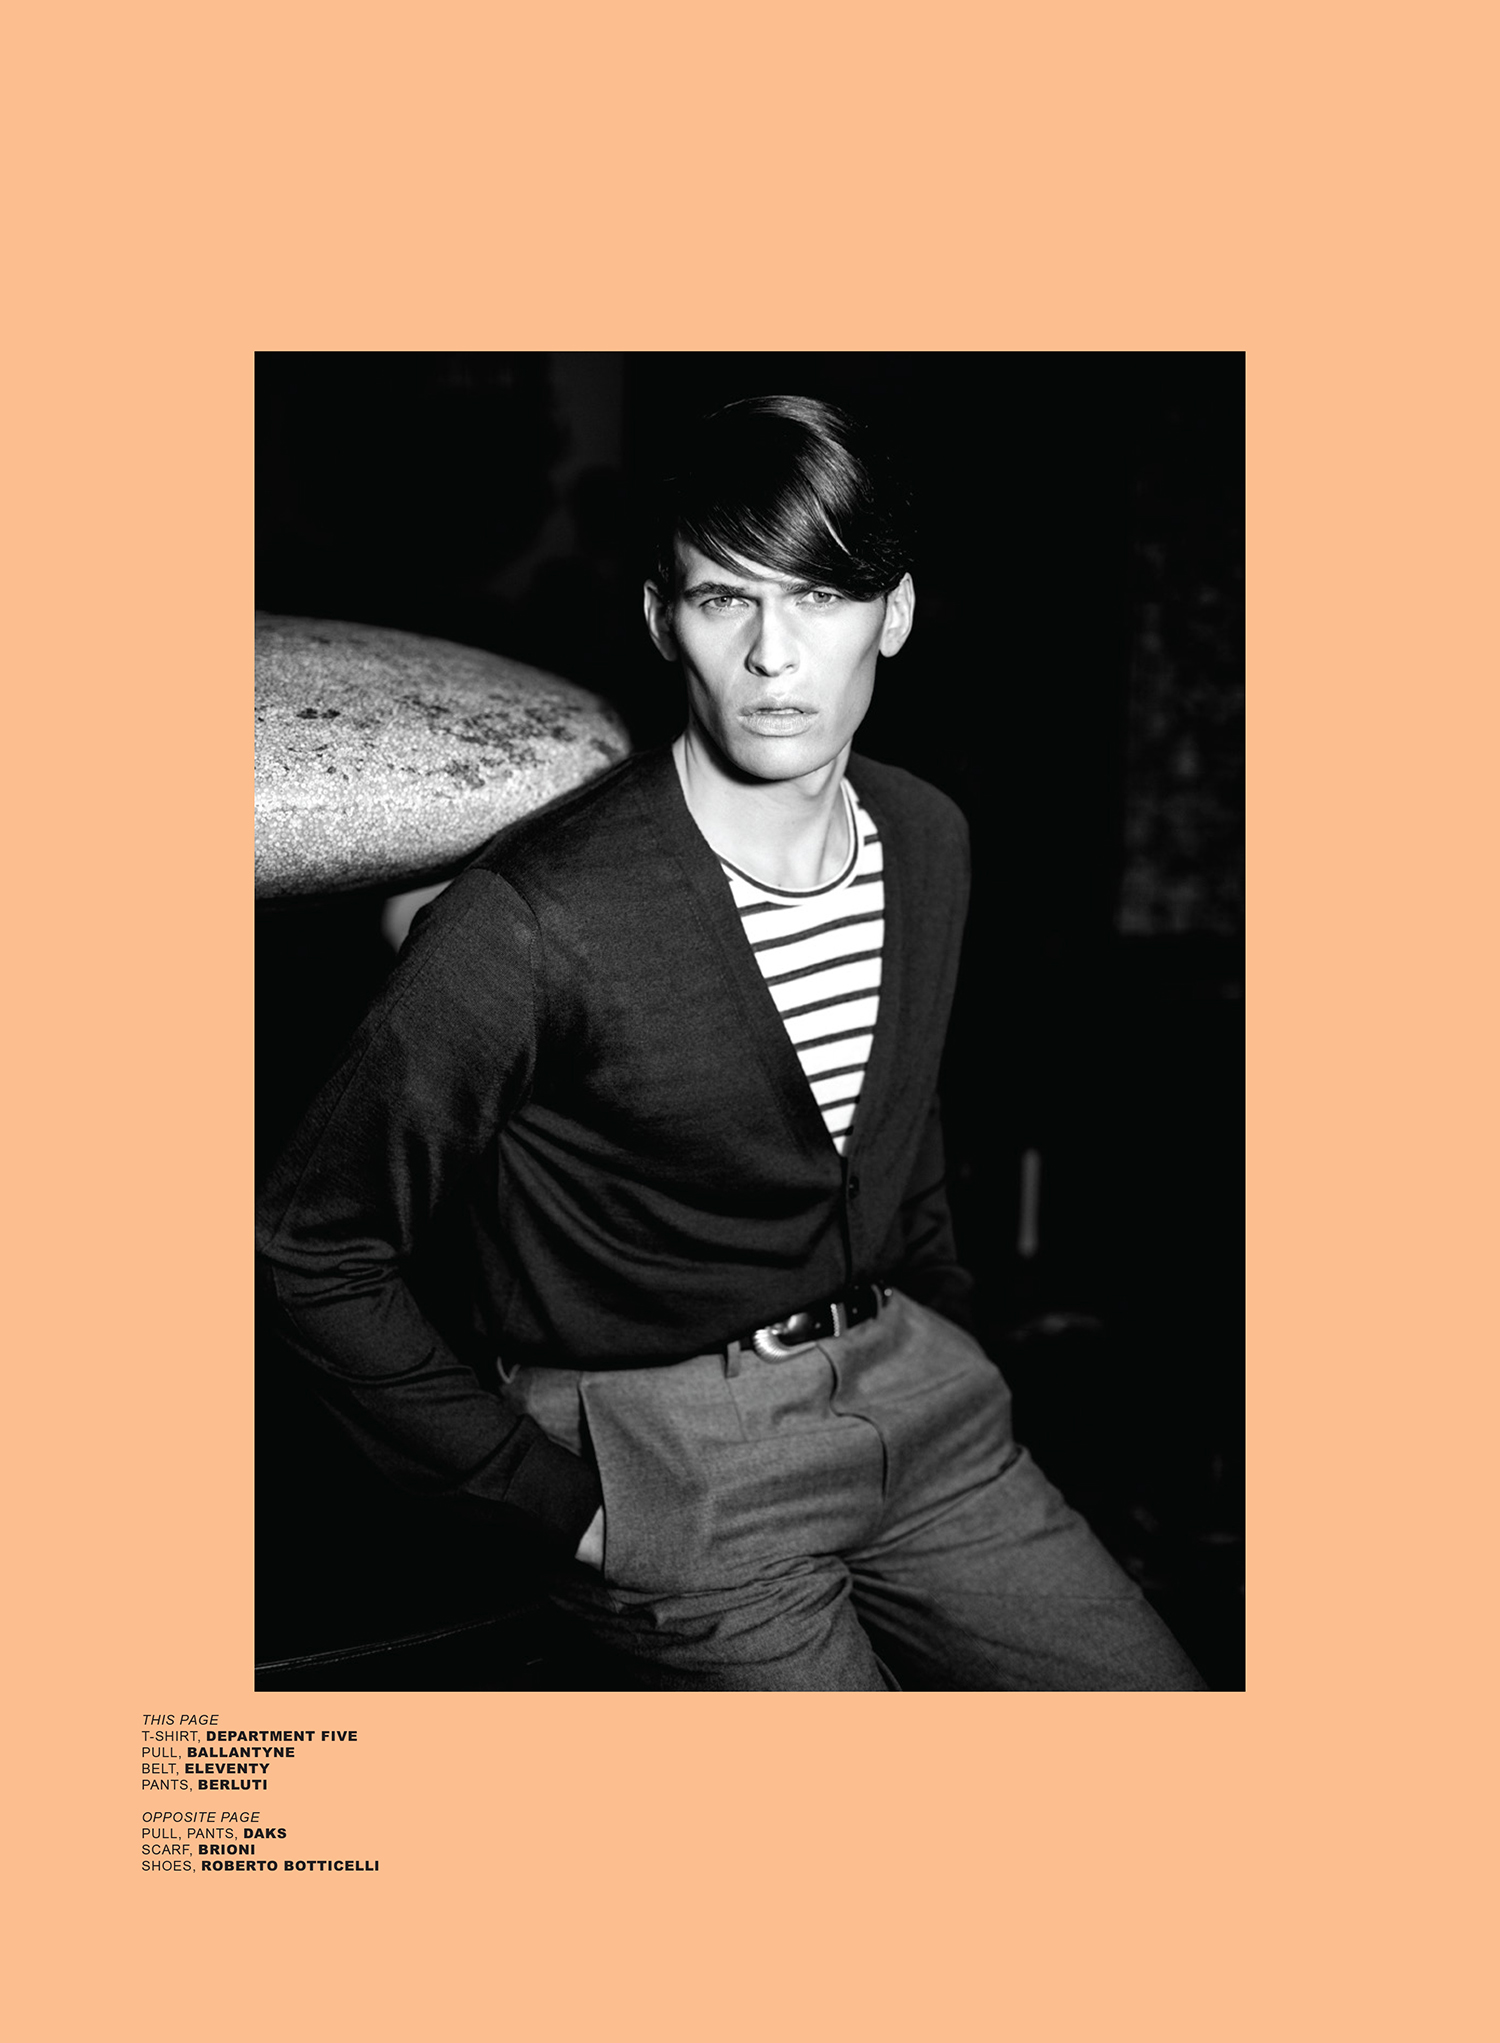 Tirade Magazine – Under the Influence